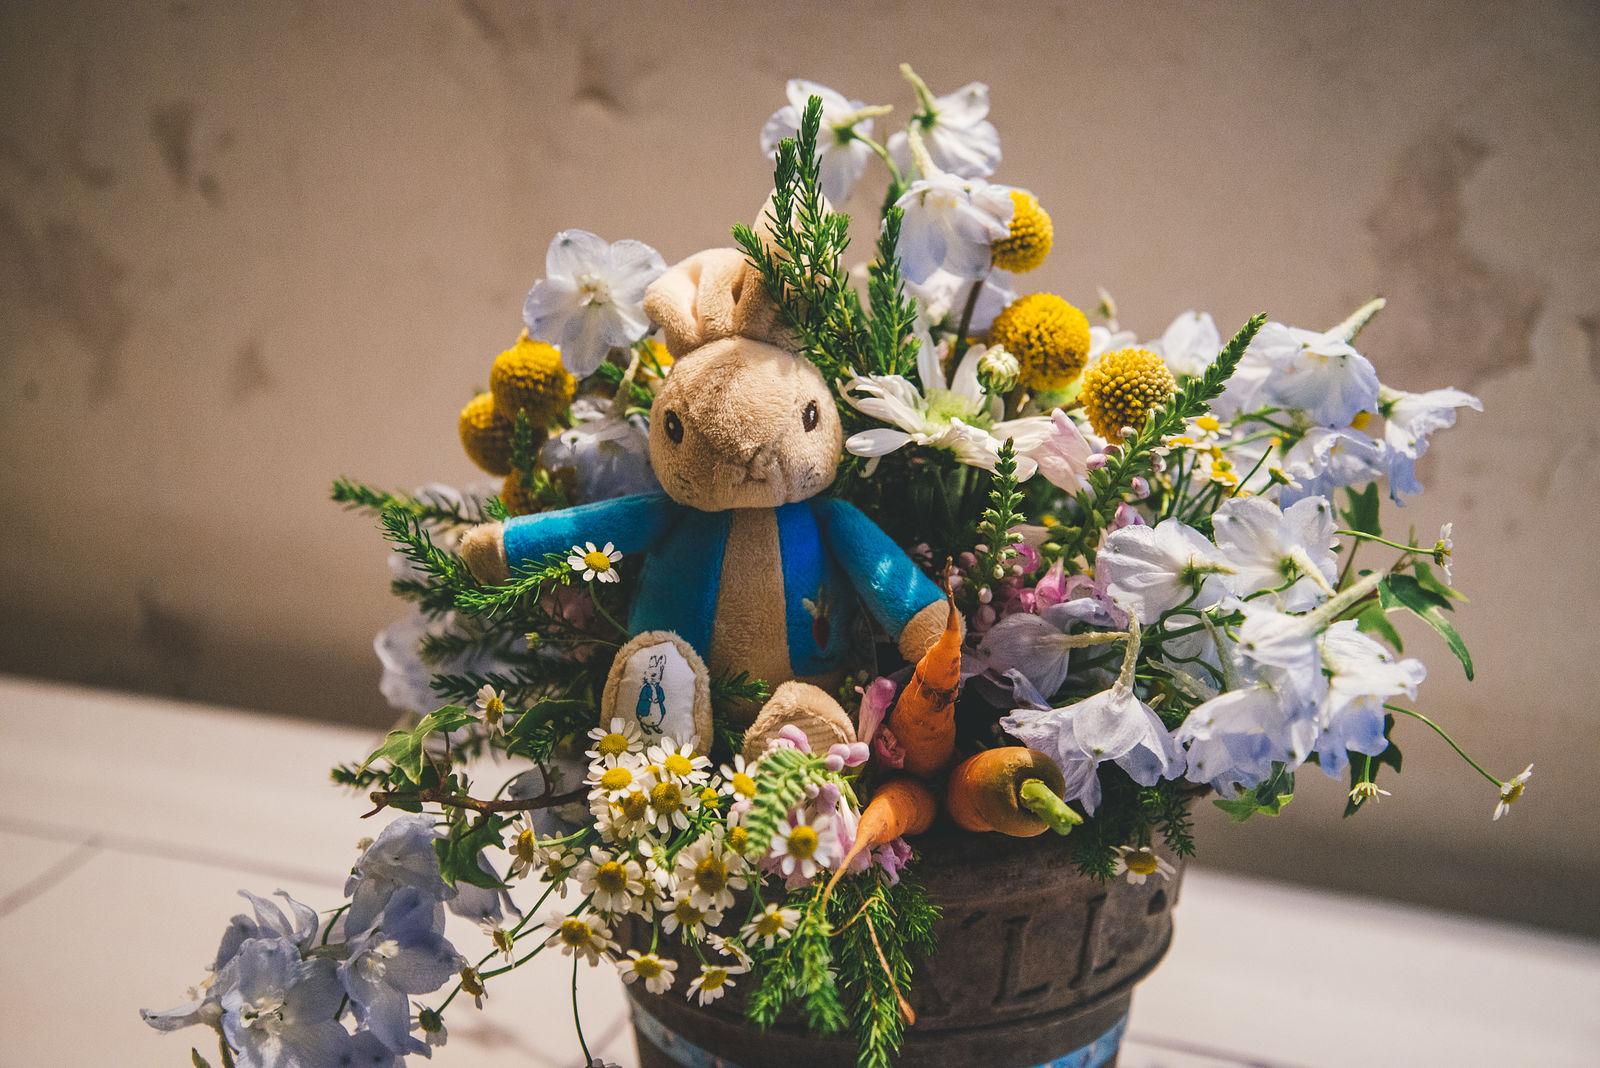 Flower & Fodder Competition